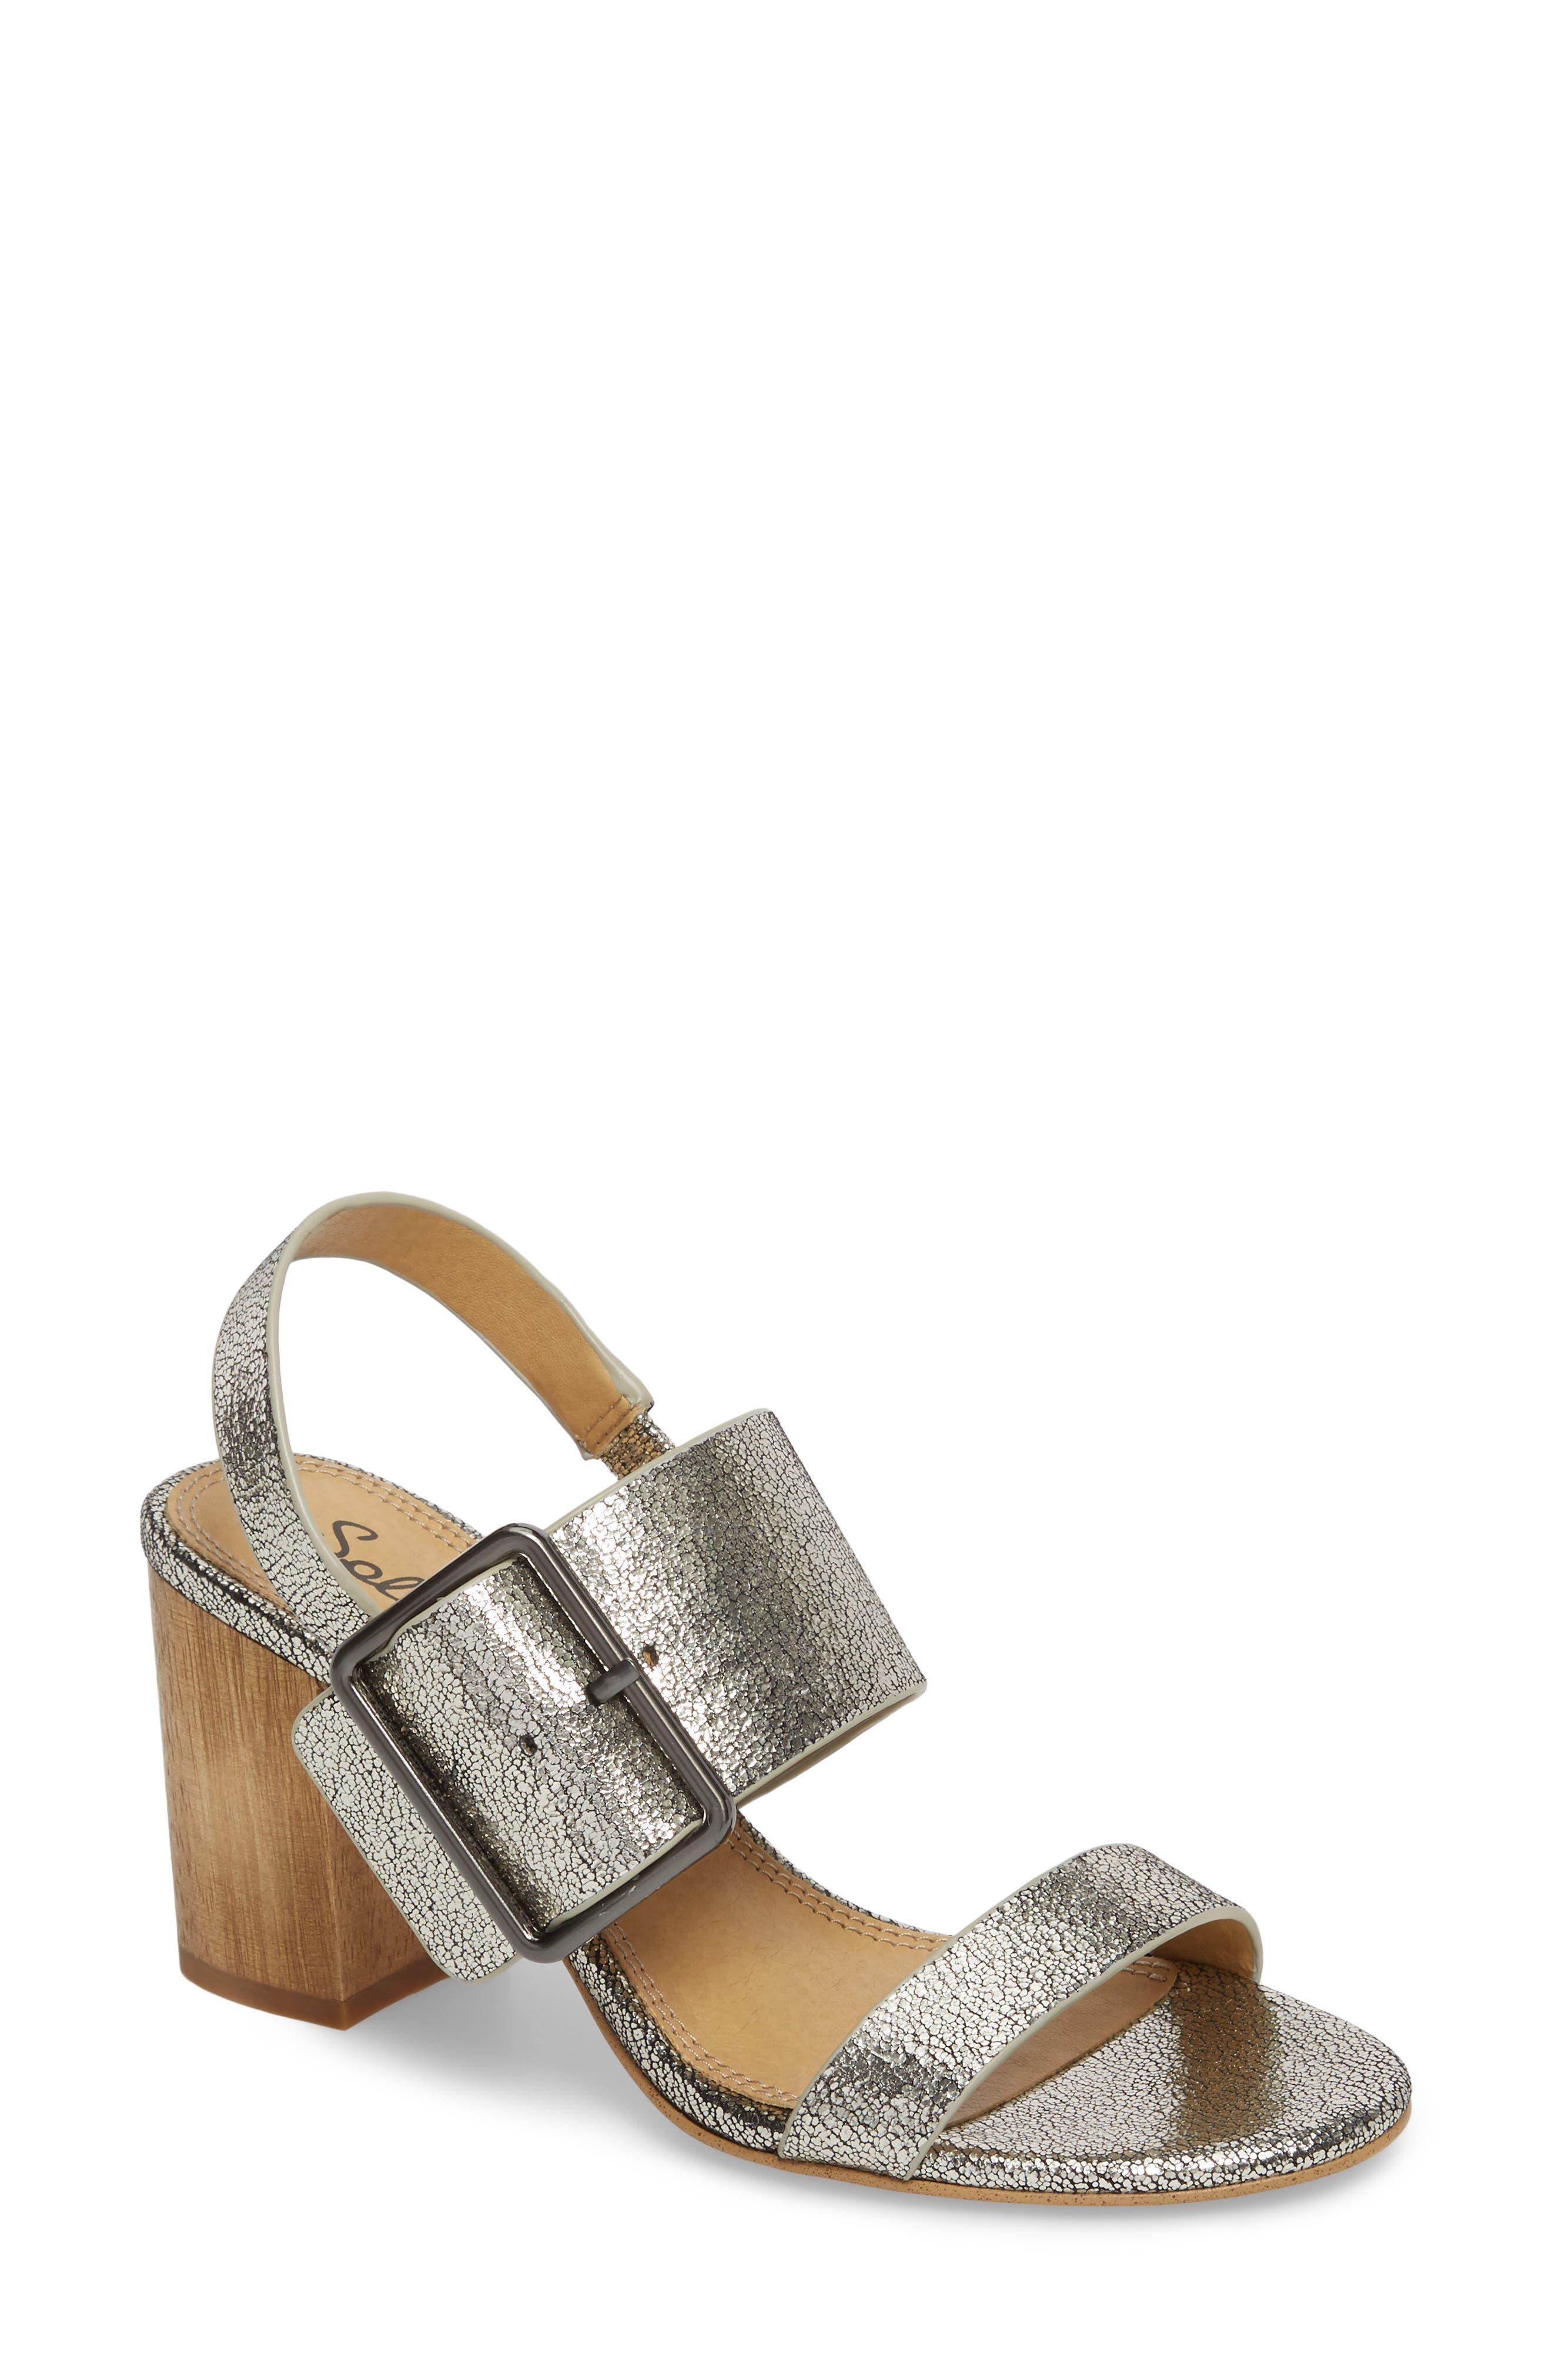 Bo Slingback Sandal,                         Main,                         color, Nickel Metallic Leather